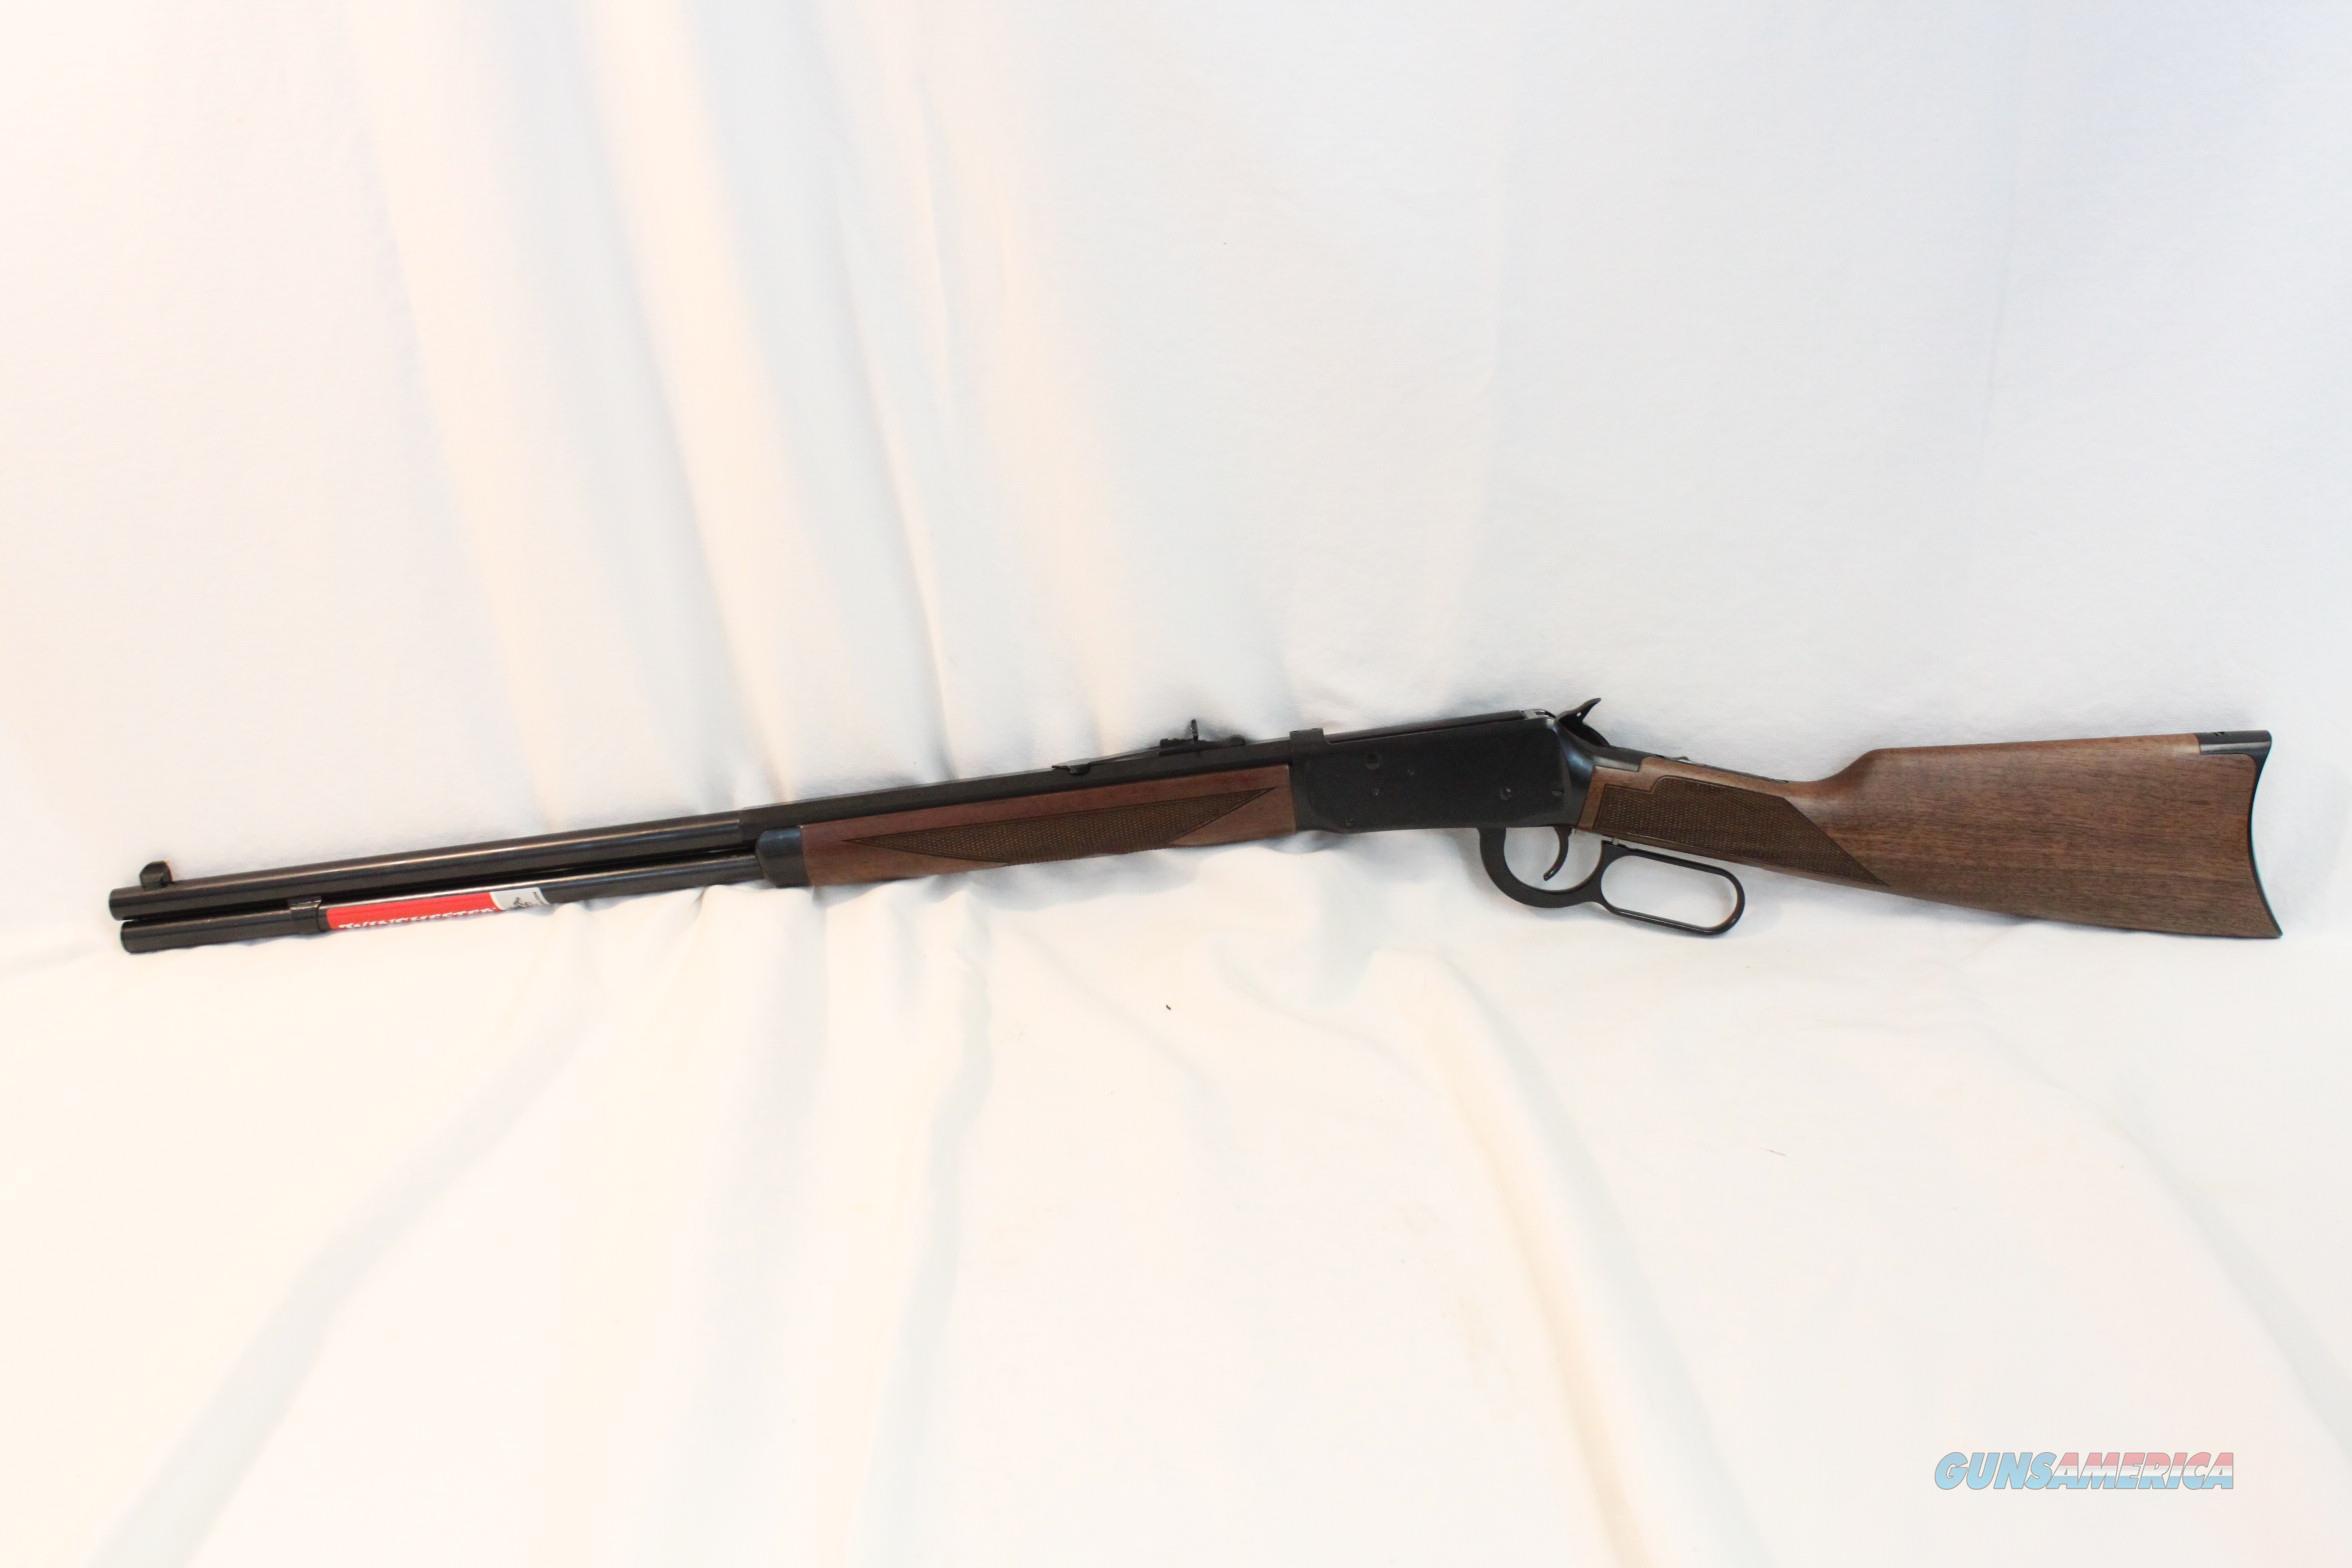 Winchester Model 94, 25-35  Guns > Rifles > Winchester Rifles - Modern Lever > Model 94 > Post-64